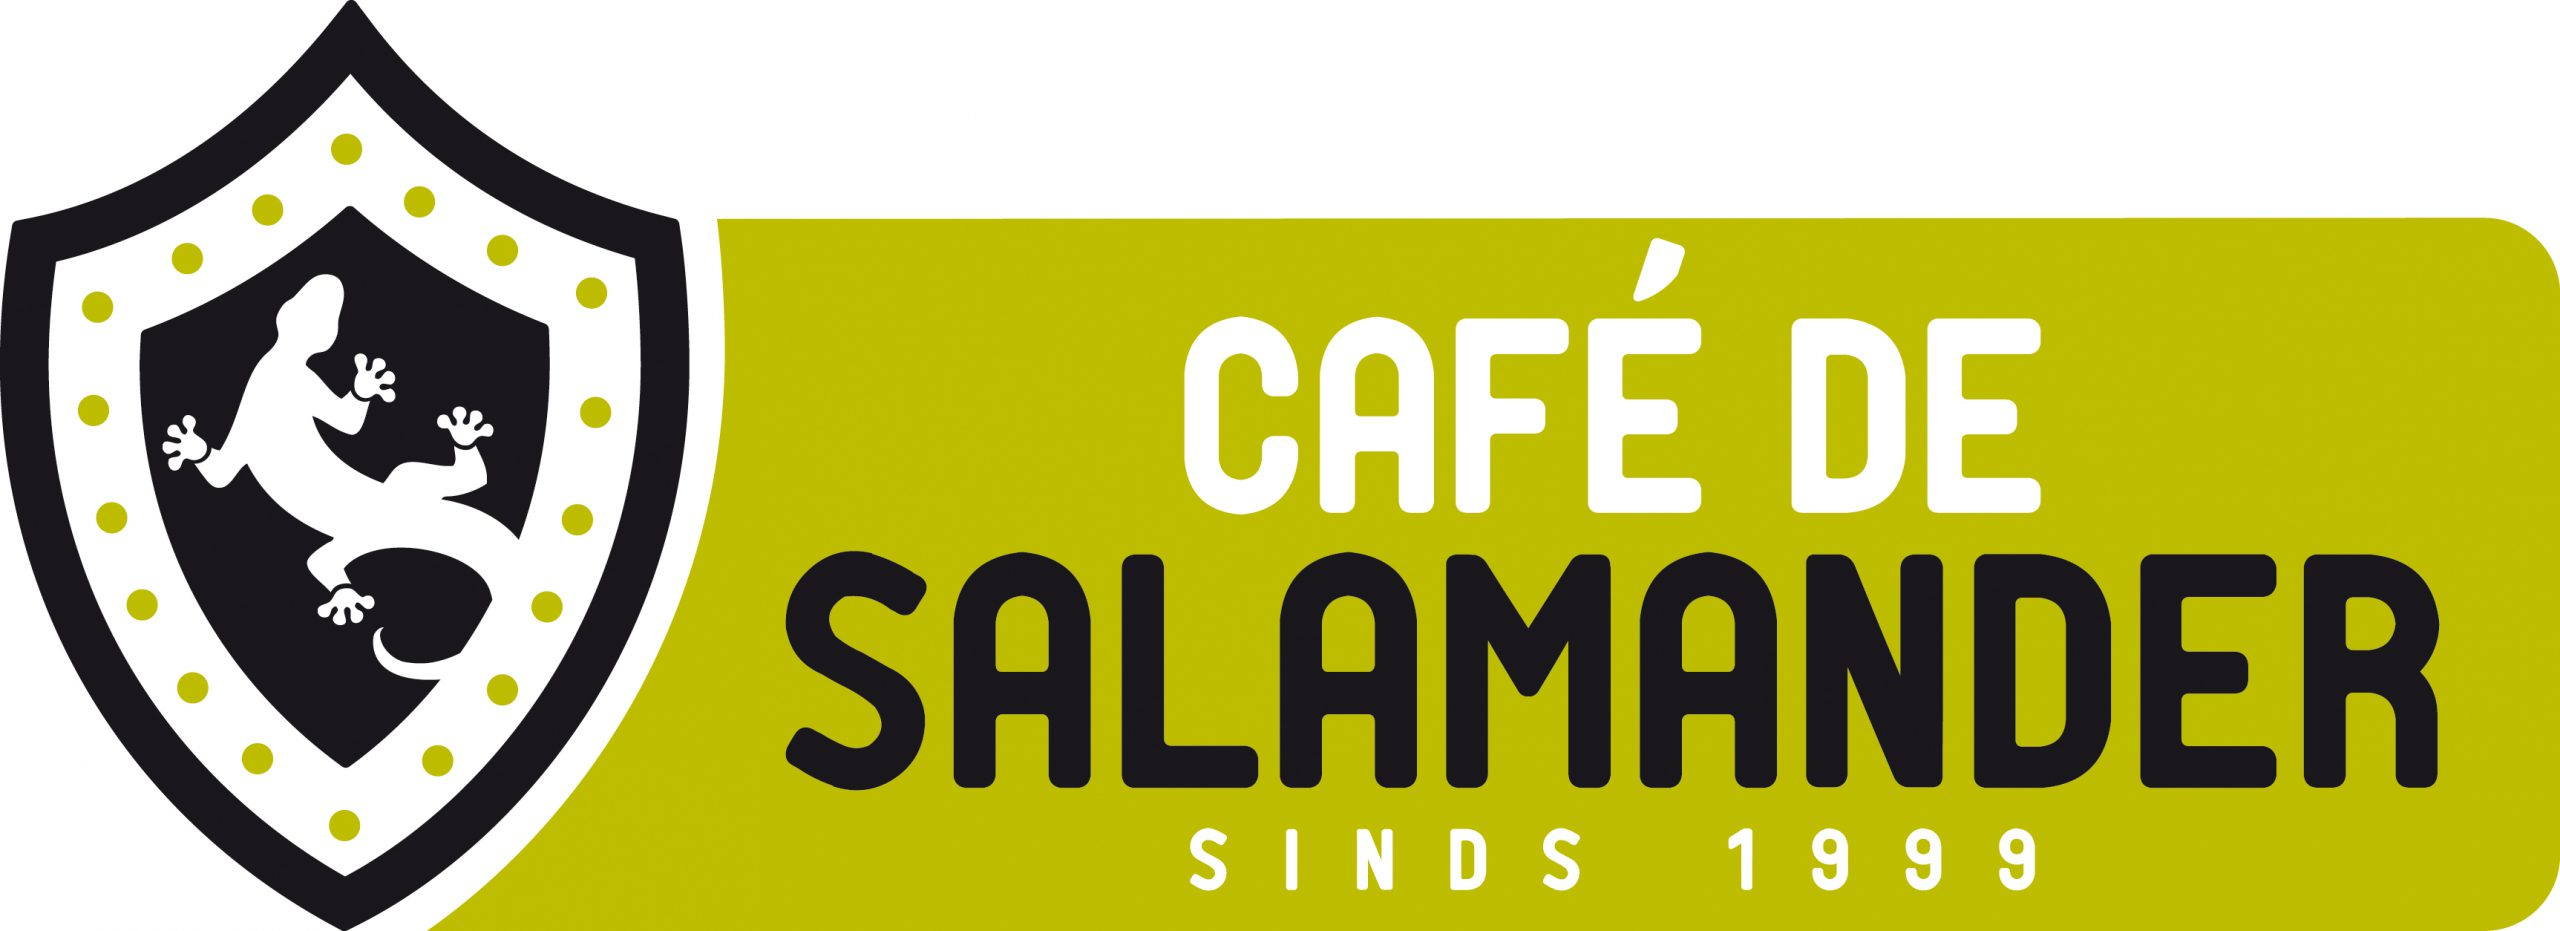 Cafe De Salamander